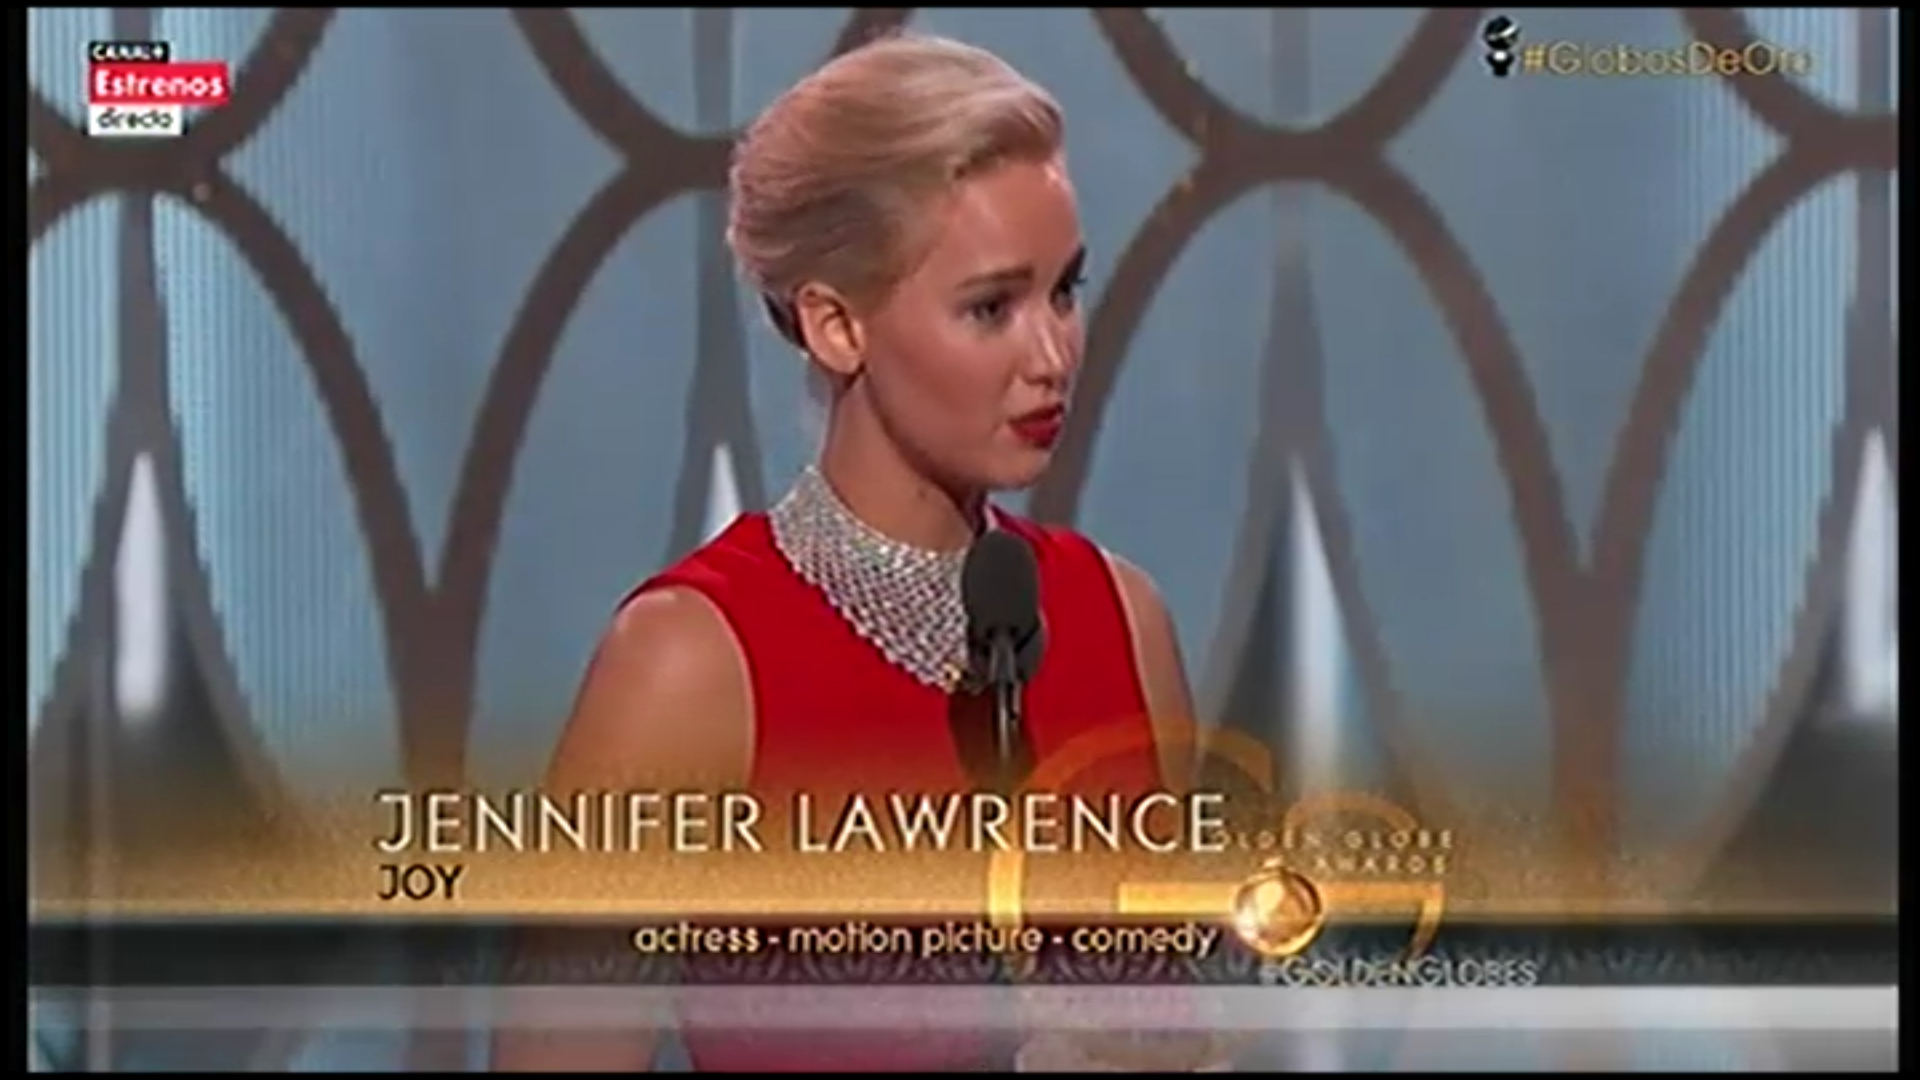 Jennifer Lawrence recogiendo su tercer Globo de Oro